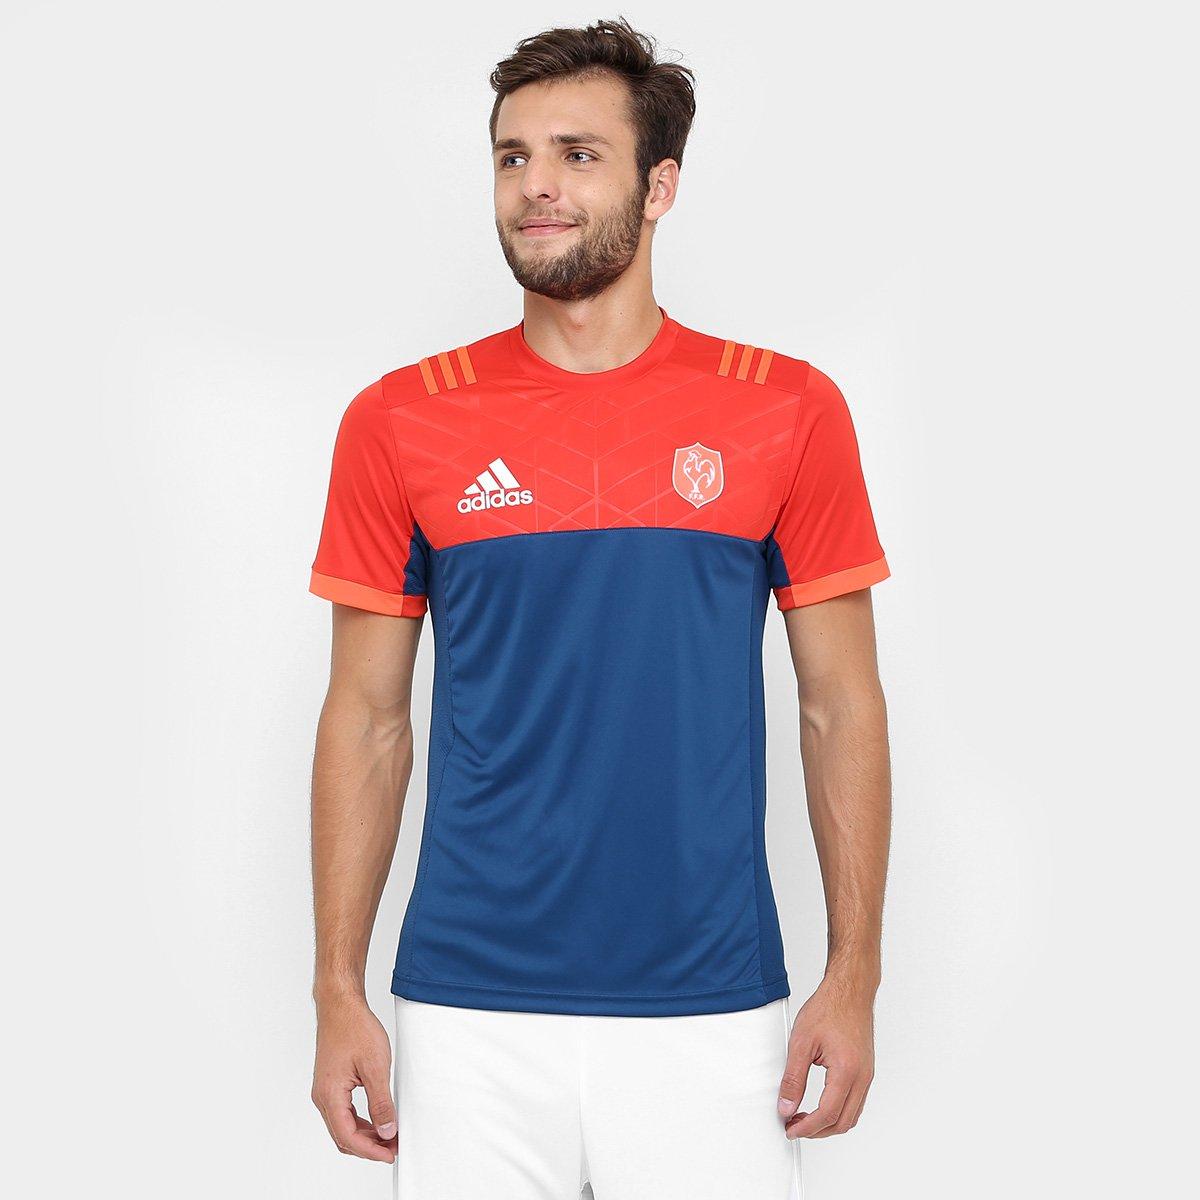 7c7a45a94 Camiseta Adidas Rugby FFR Performance - Compre Agora